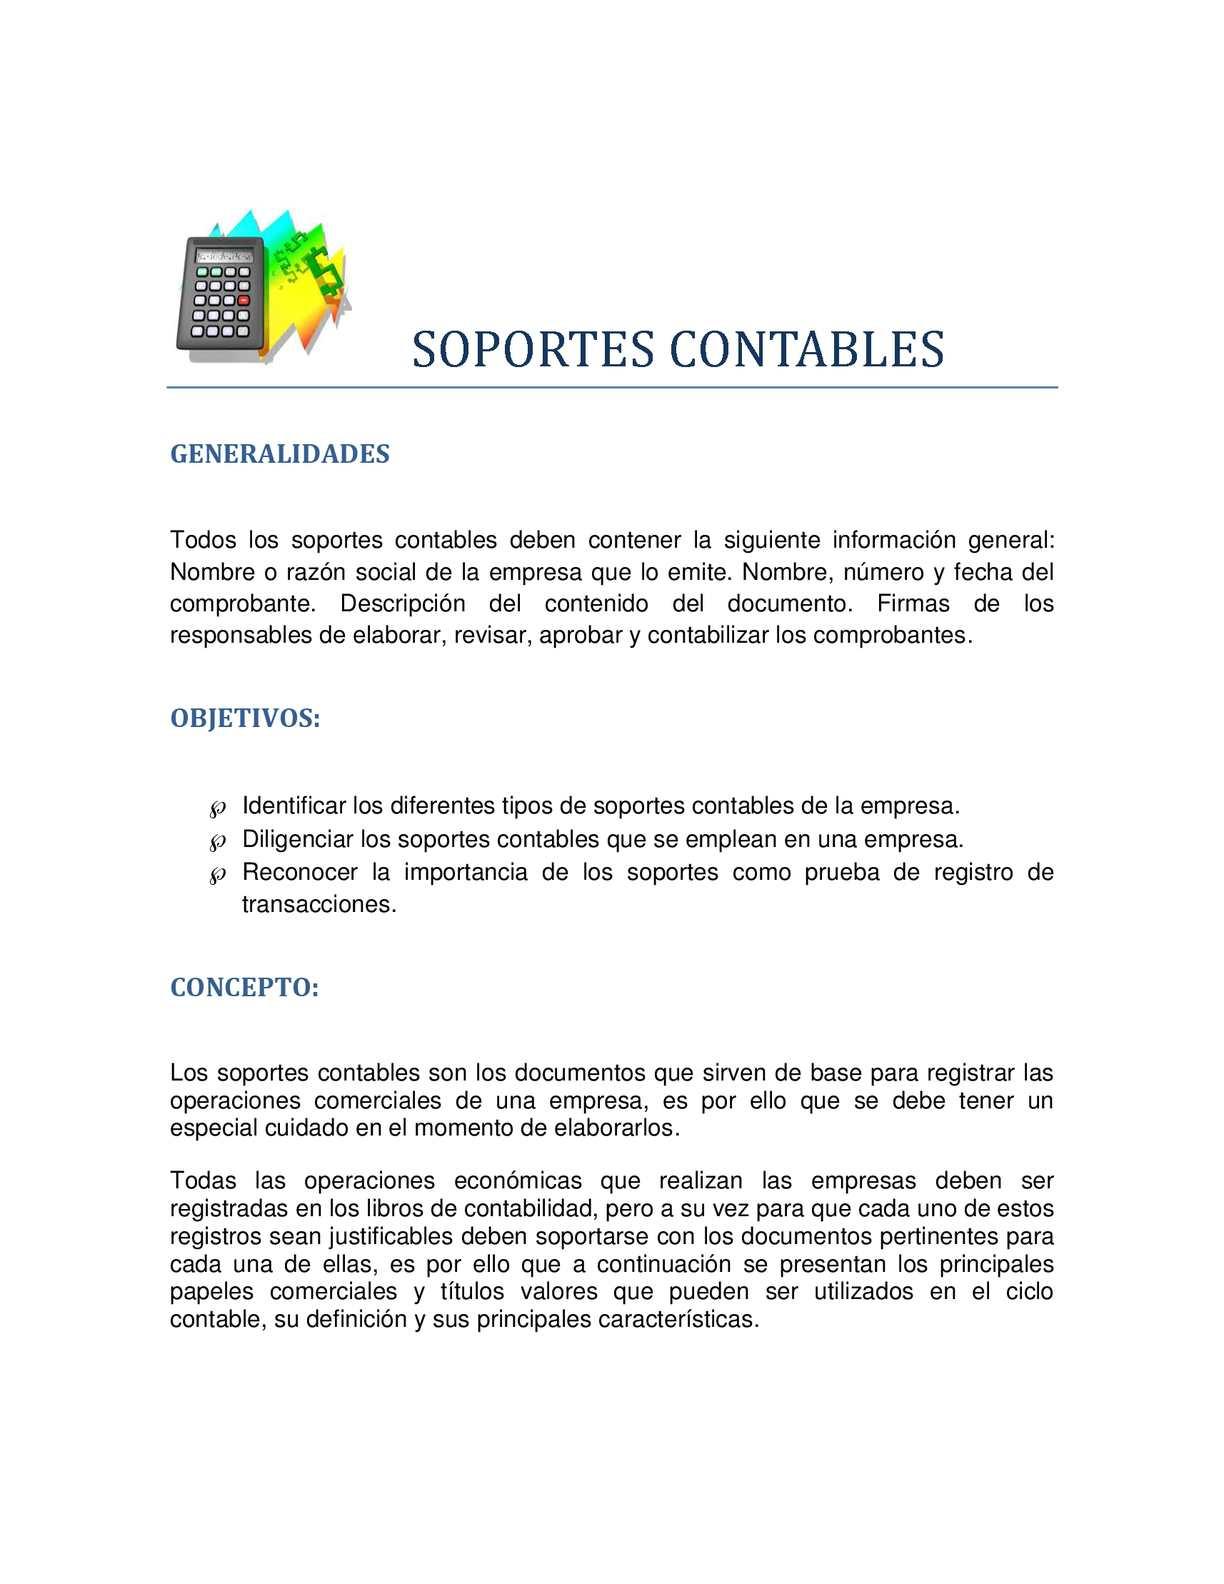 Calaméo - SOPORTES CONTABLES